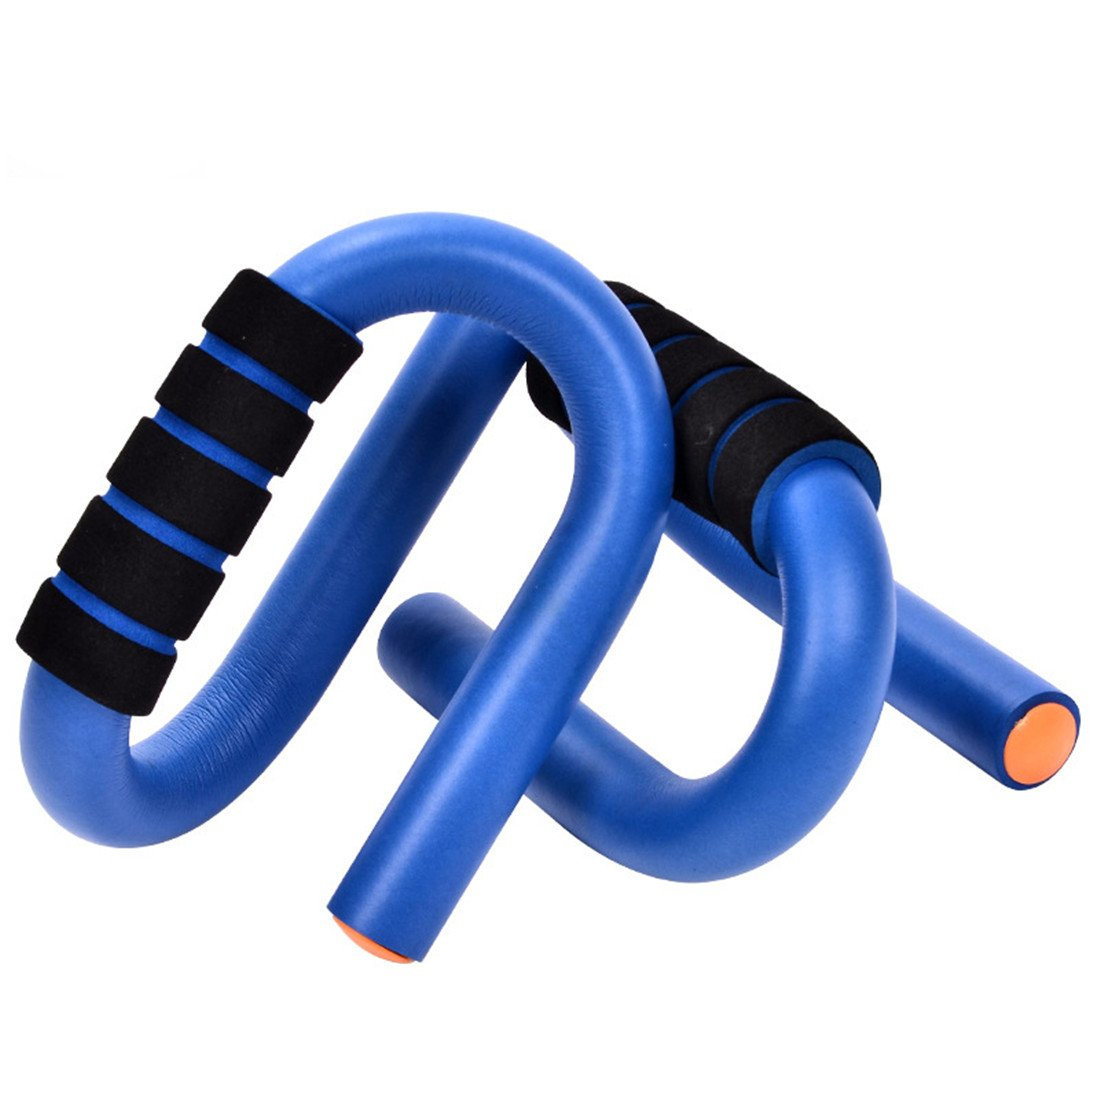 Gymforward S-Shape Push Up Stand Bars Strength Training Pull-Up Bars EVA Foam Padded Handle Grips by Gymforward